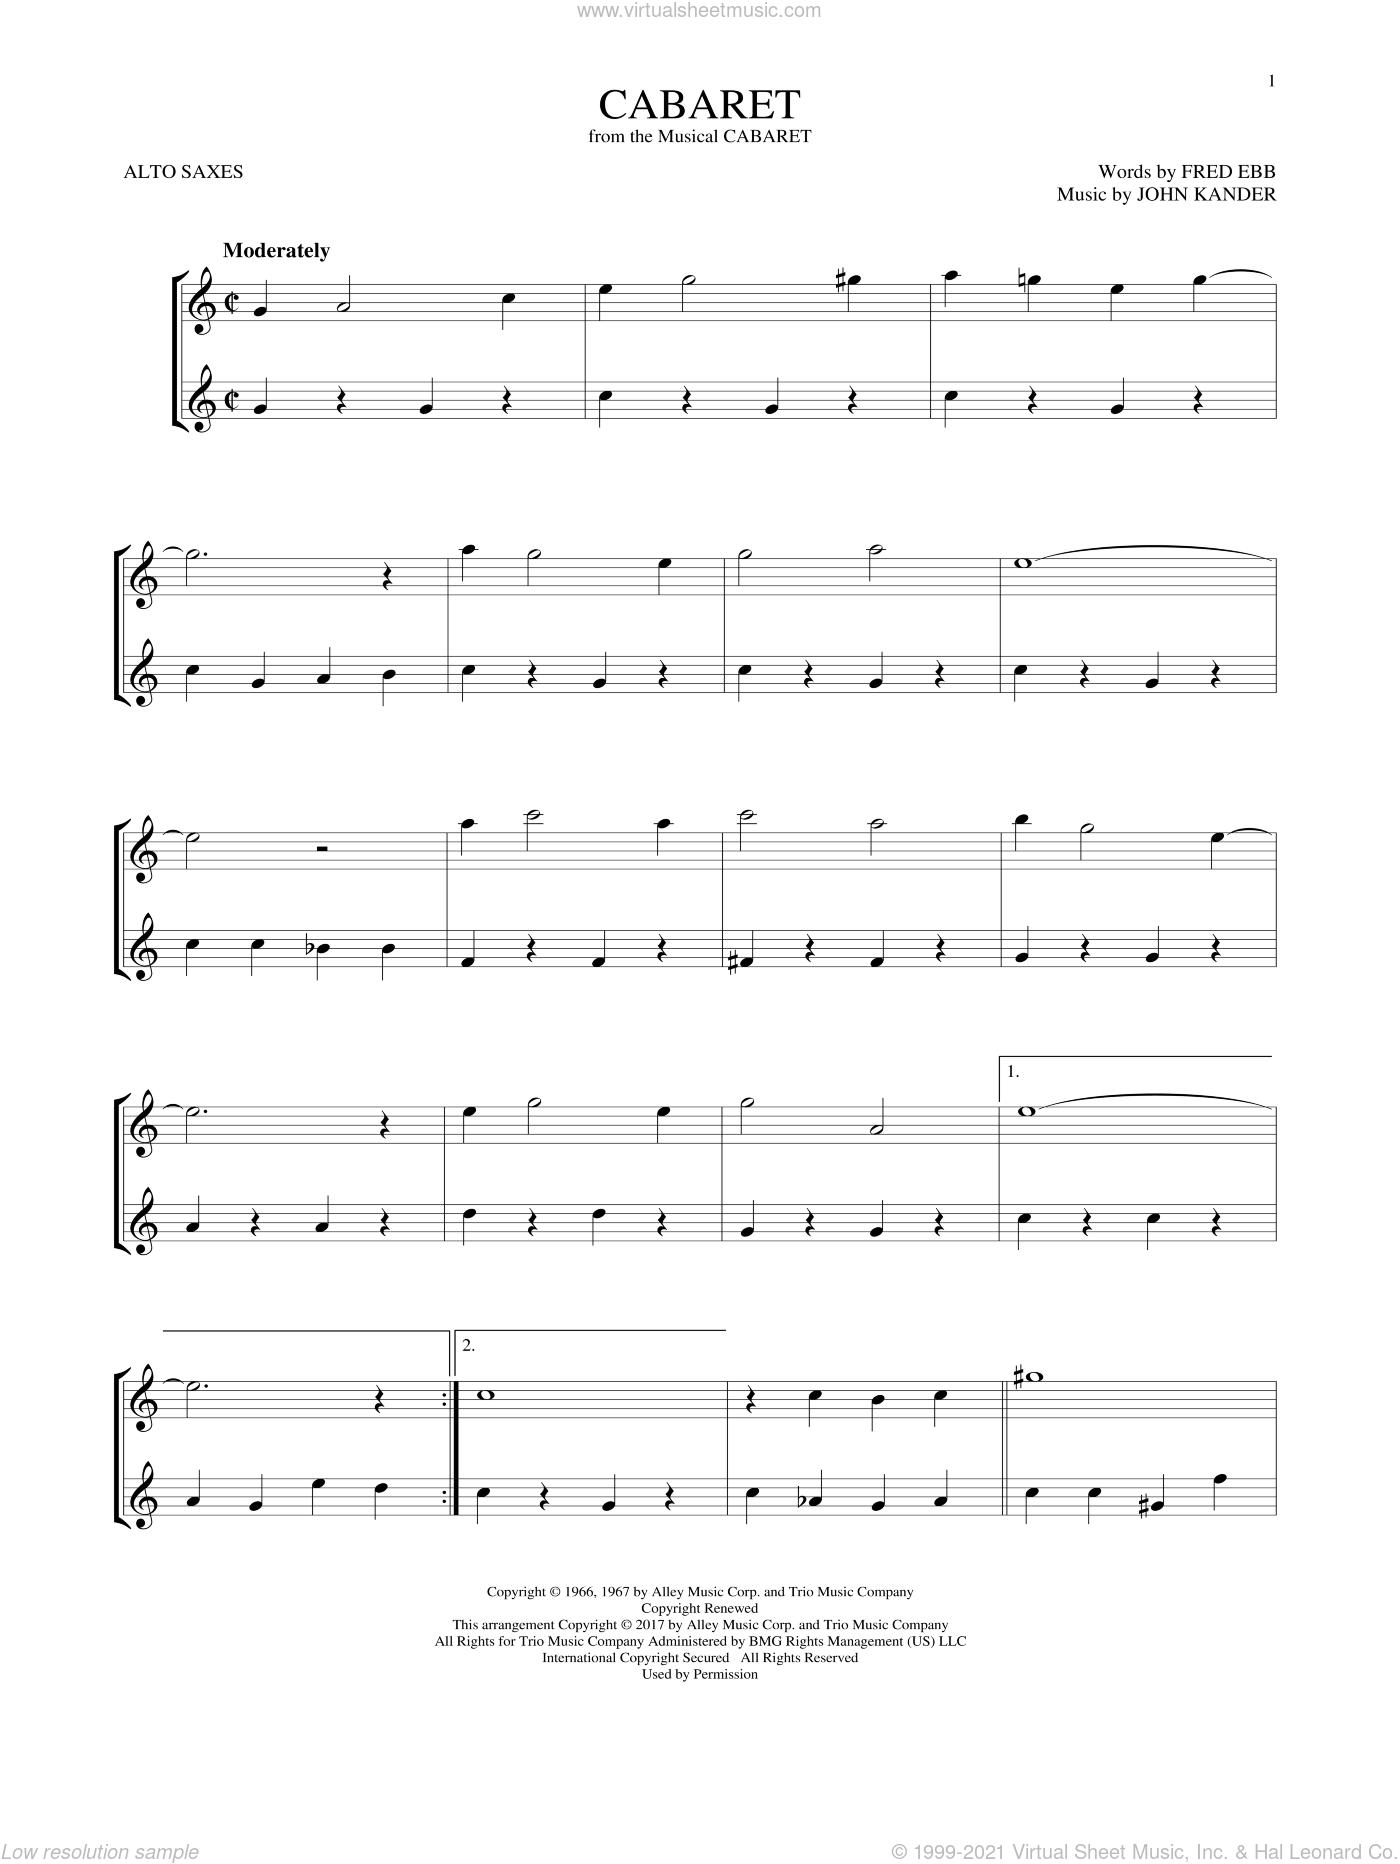 Cabaret sheet music for two alto saxophones (duets) by John Kander, Herb Alpert & The Tijuana Brass and Fred Ebb, intermediate skill level